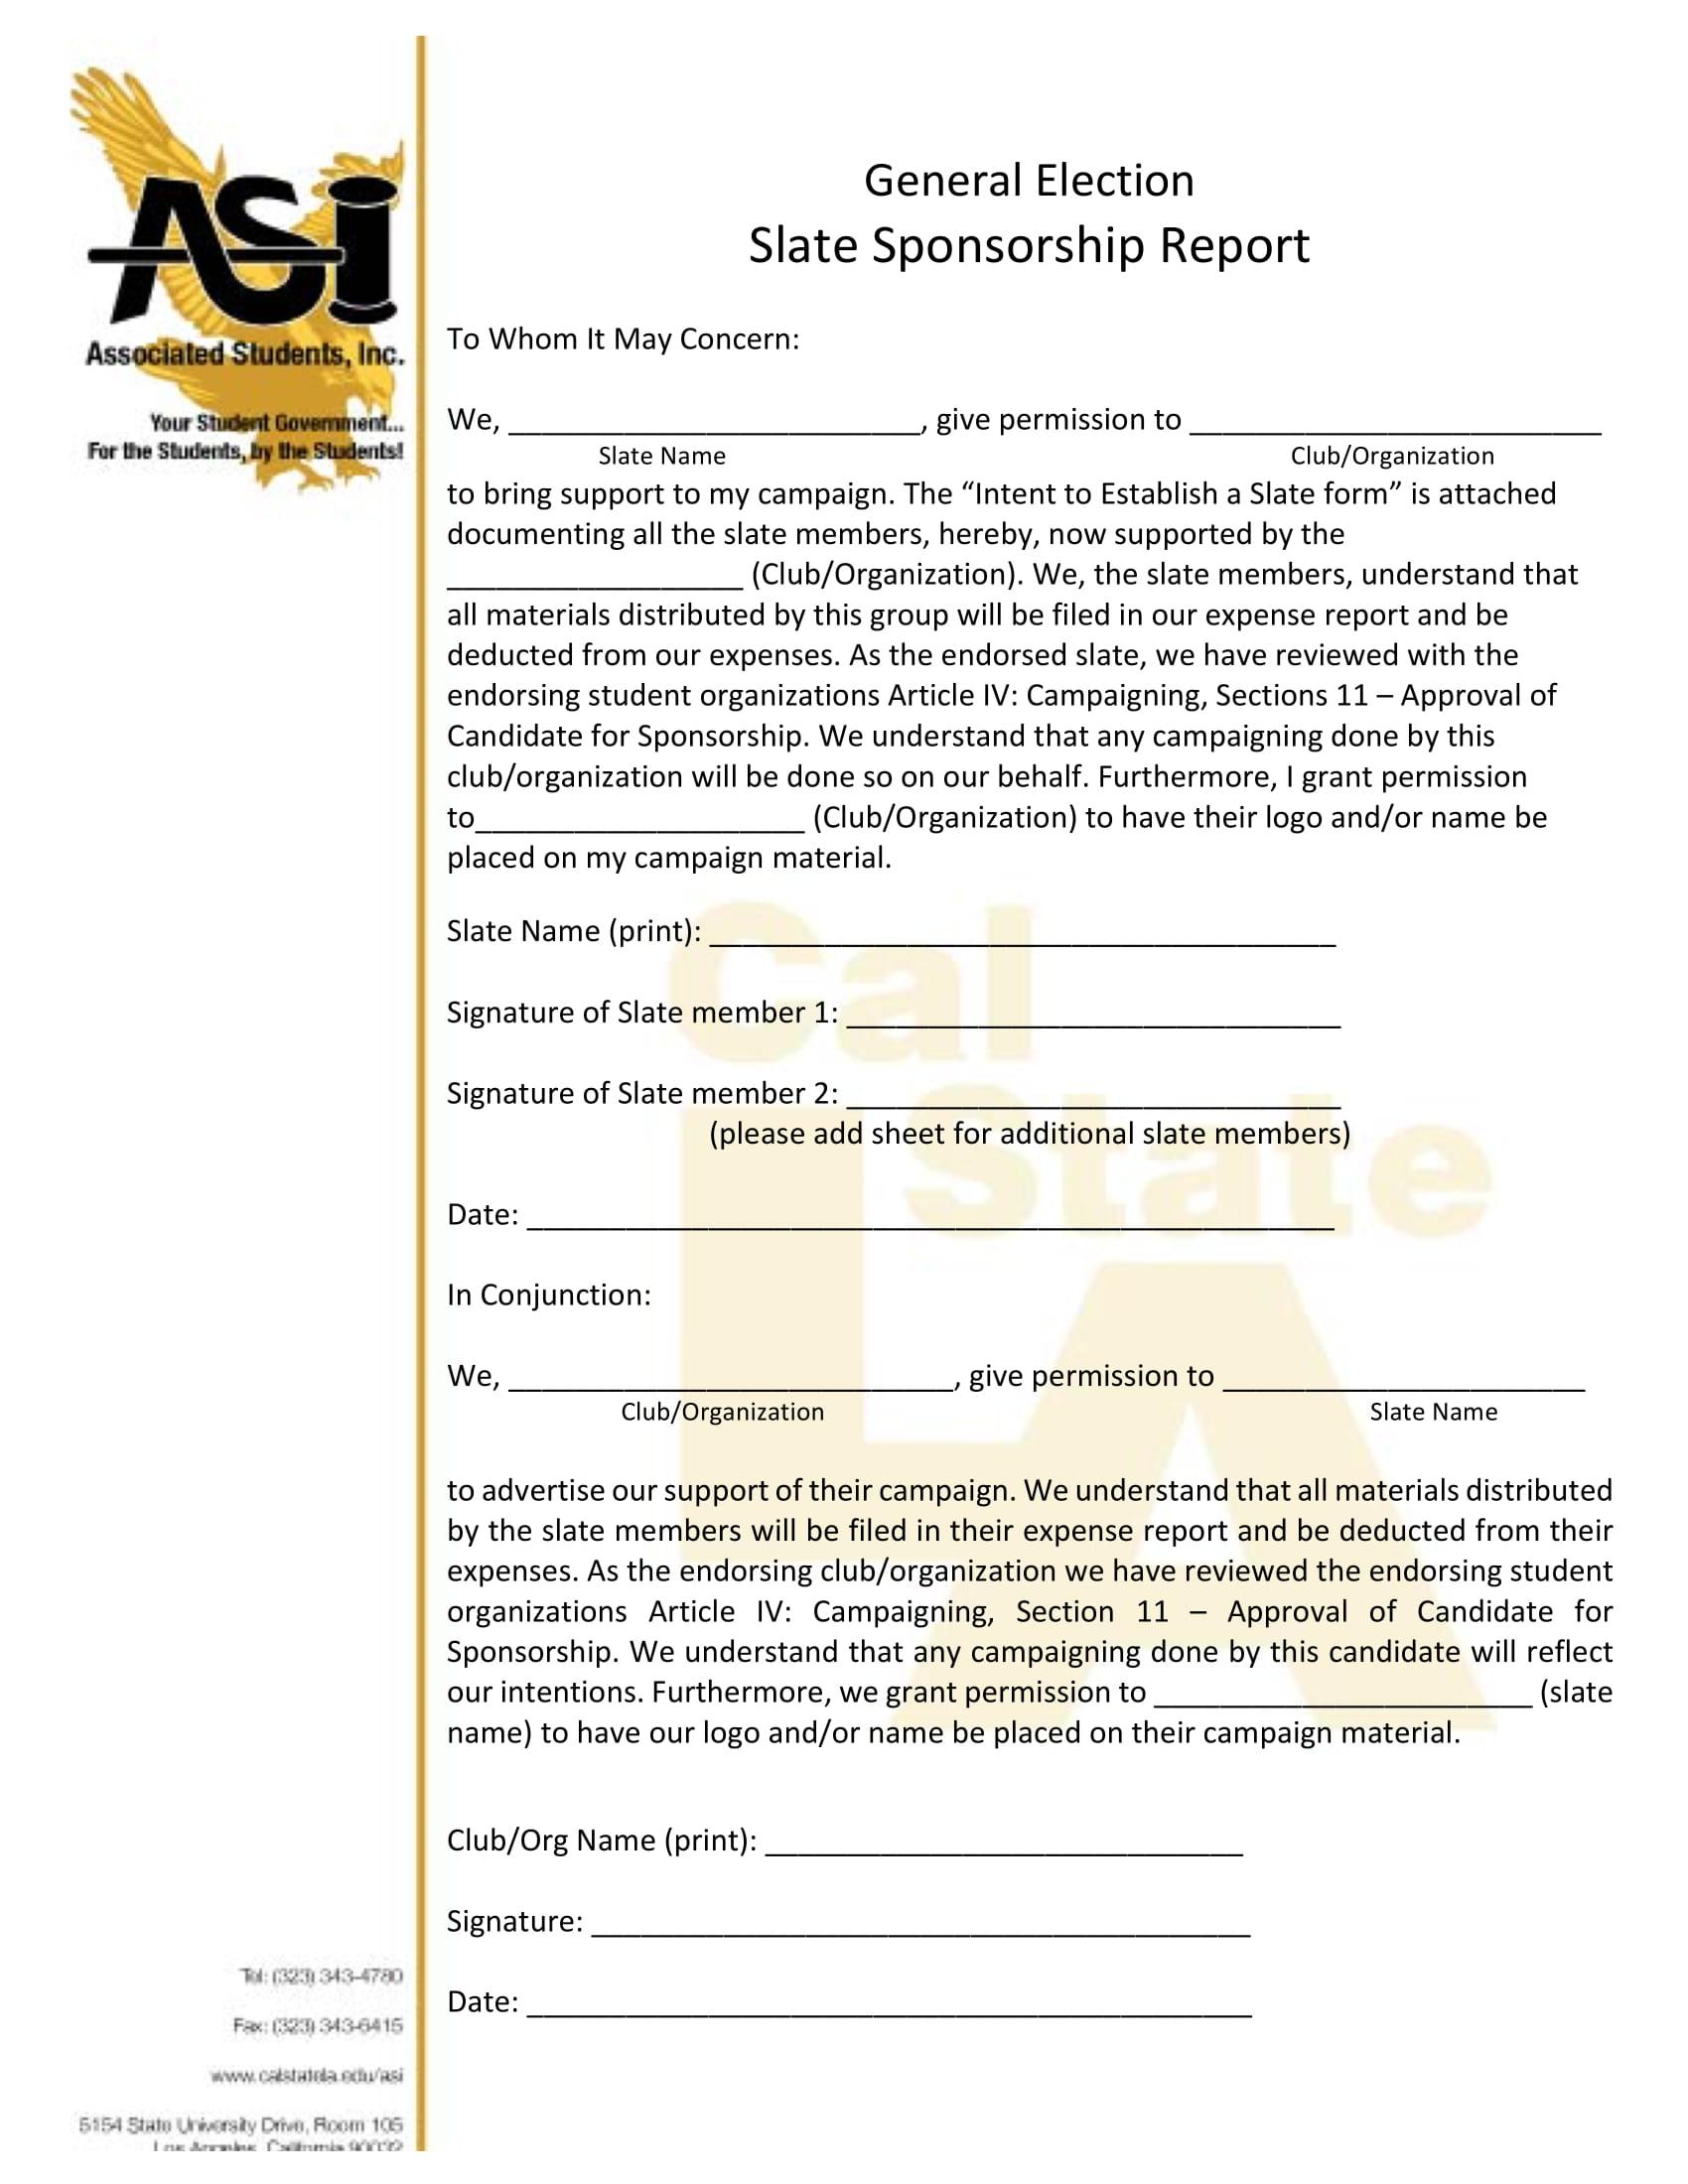 slate sponsorship report form 1